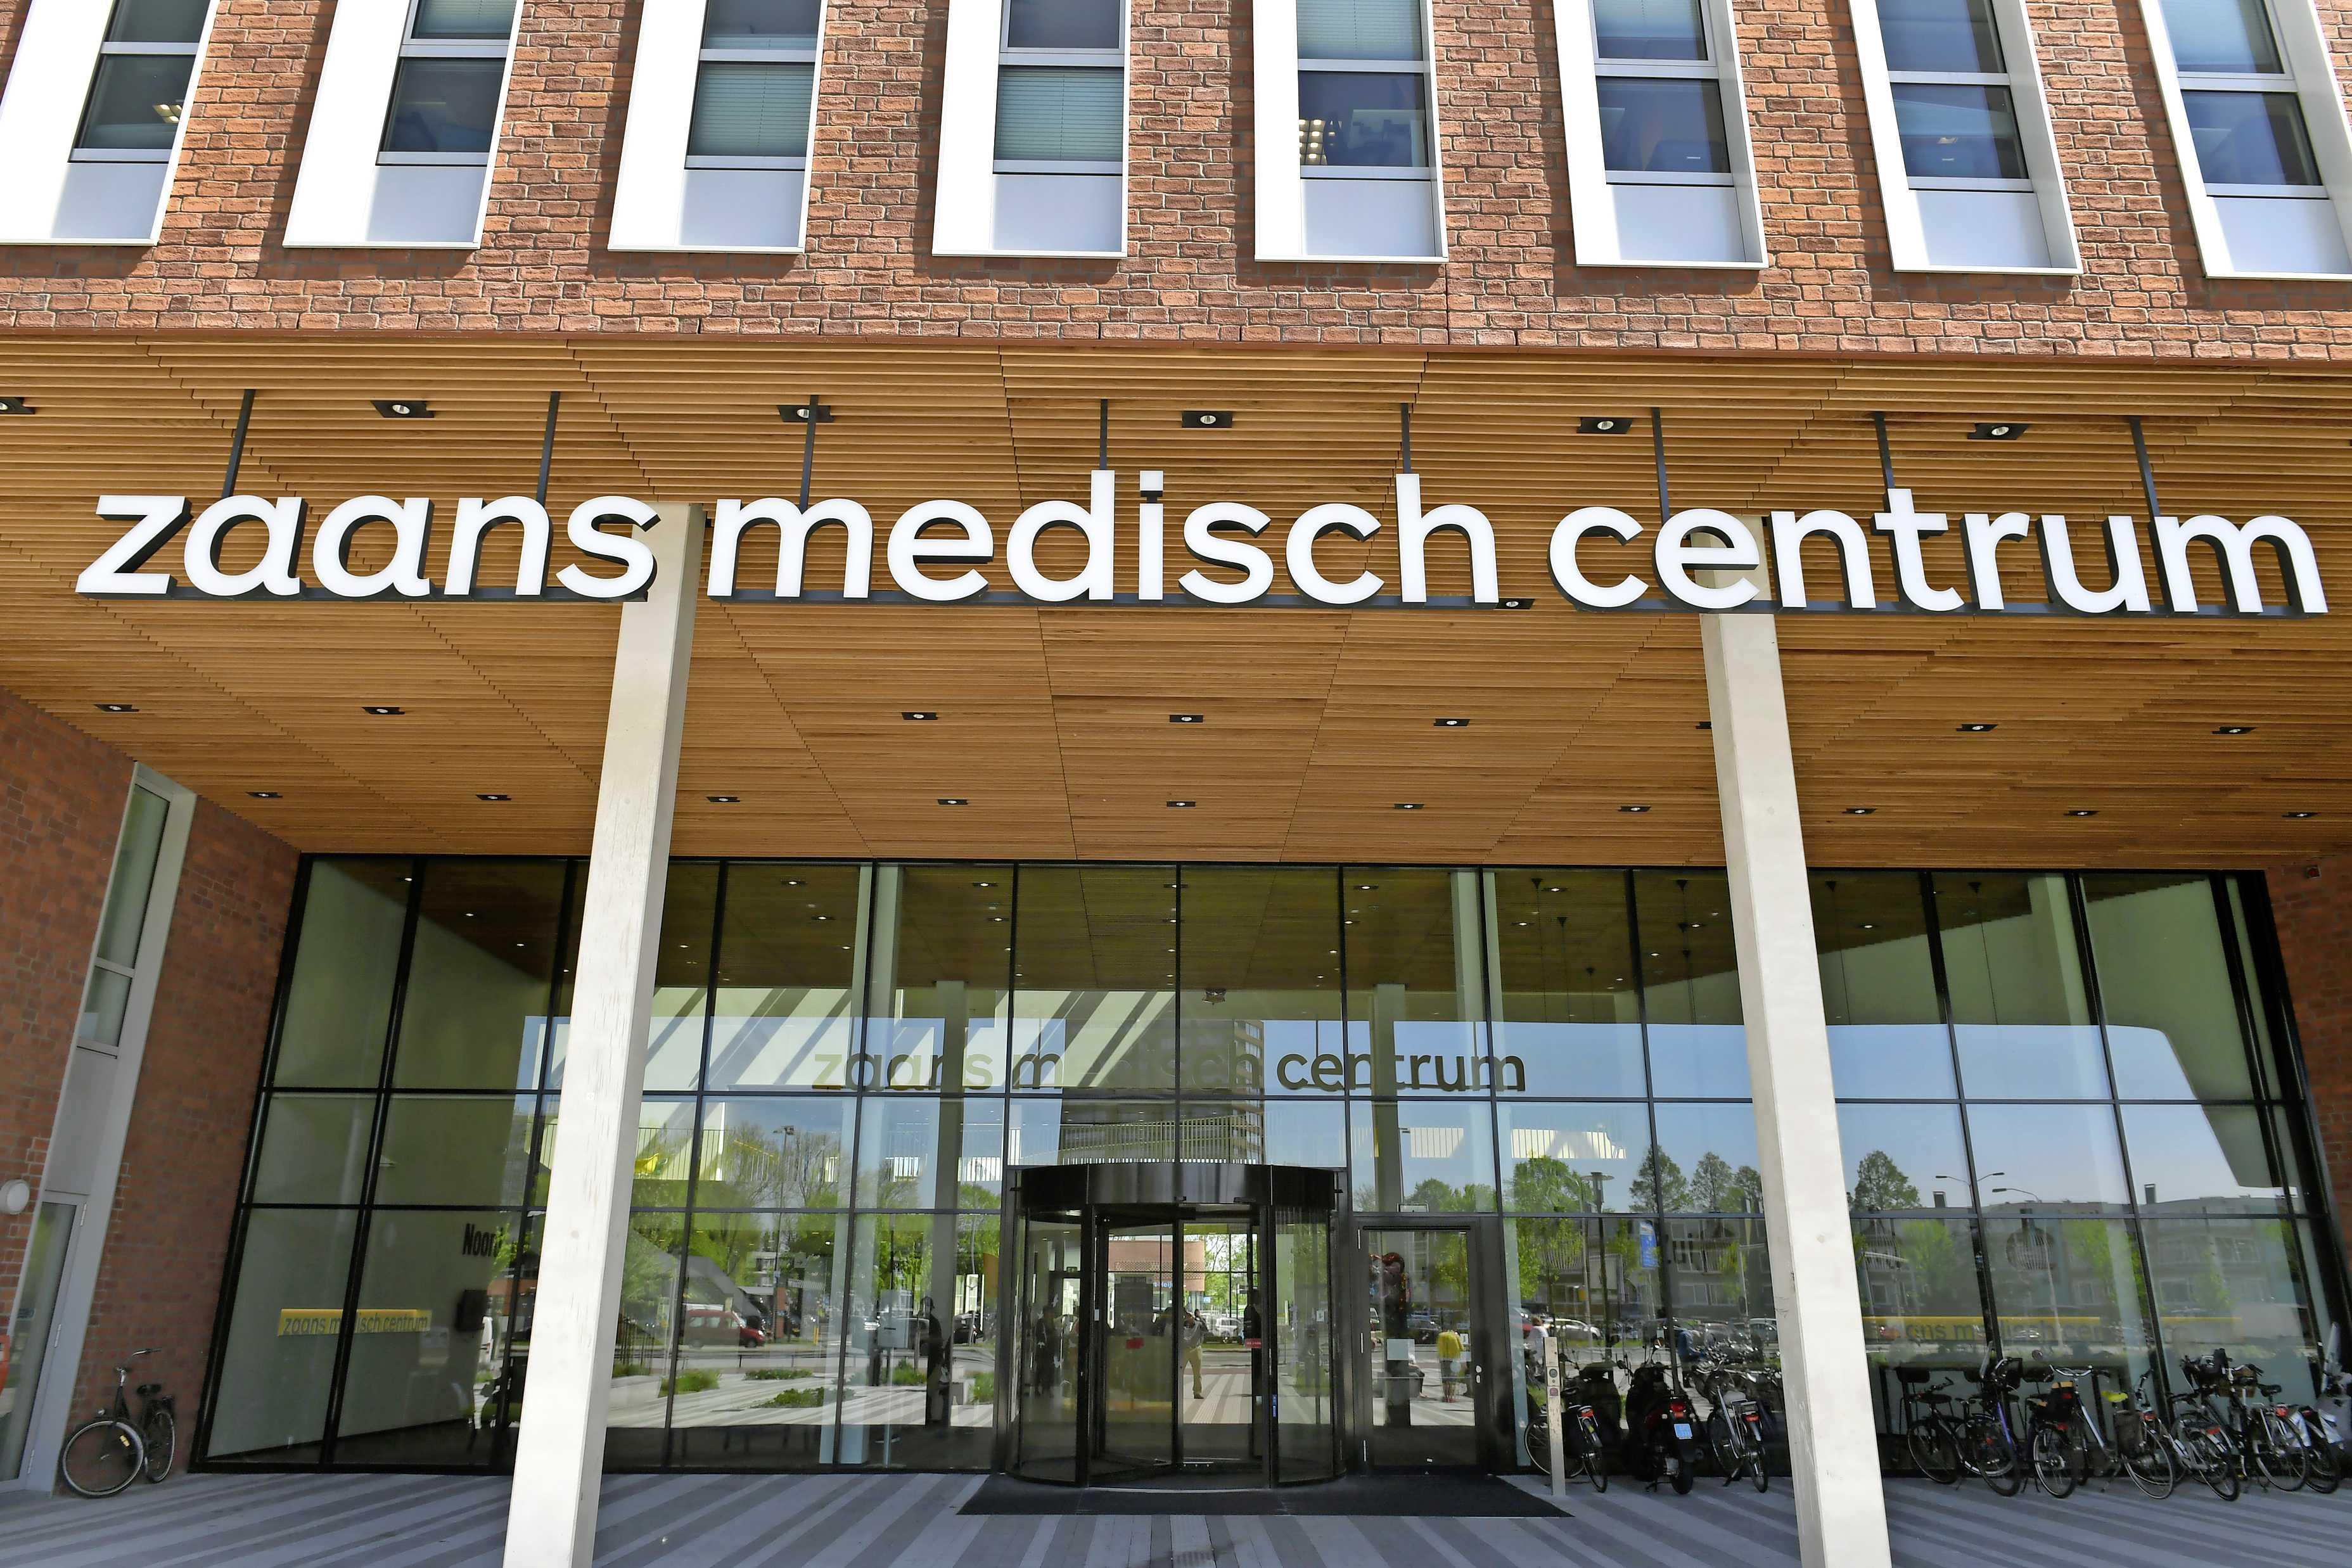 bakterie zaans medisch centrum